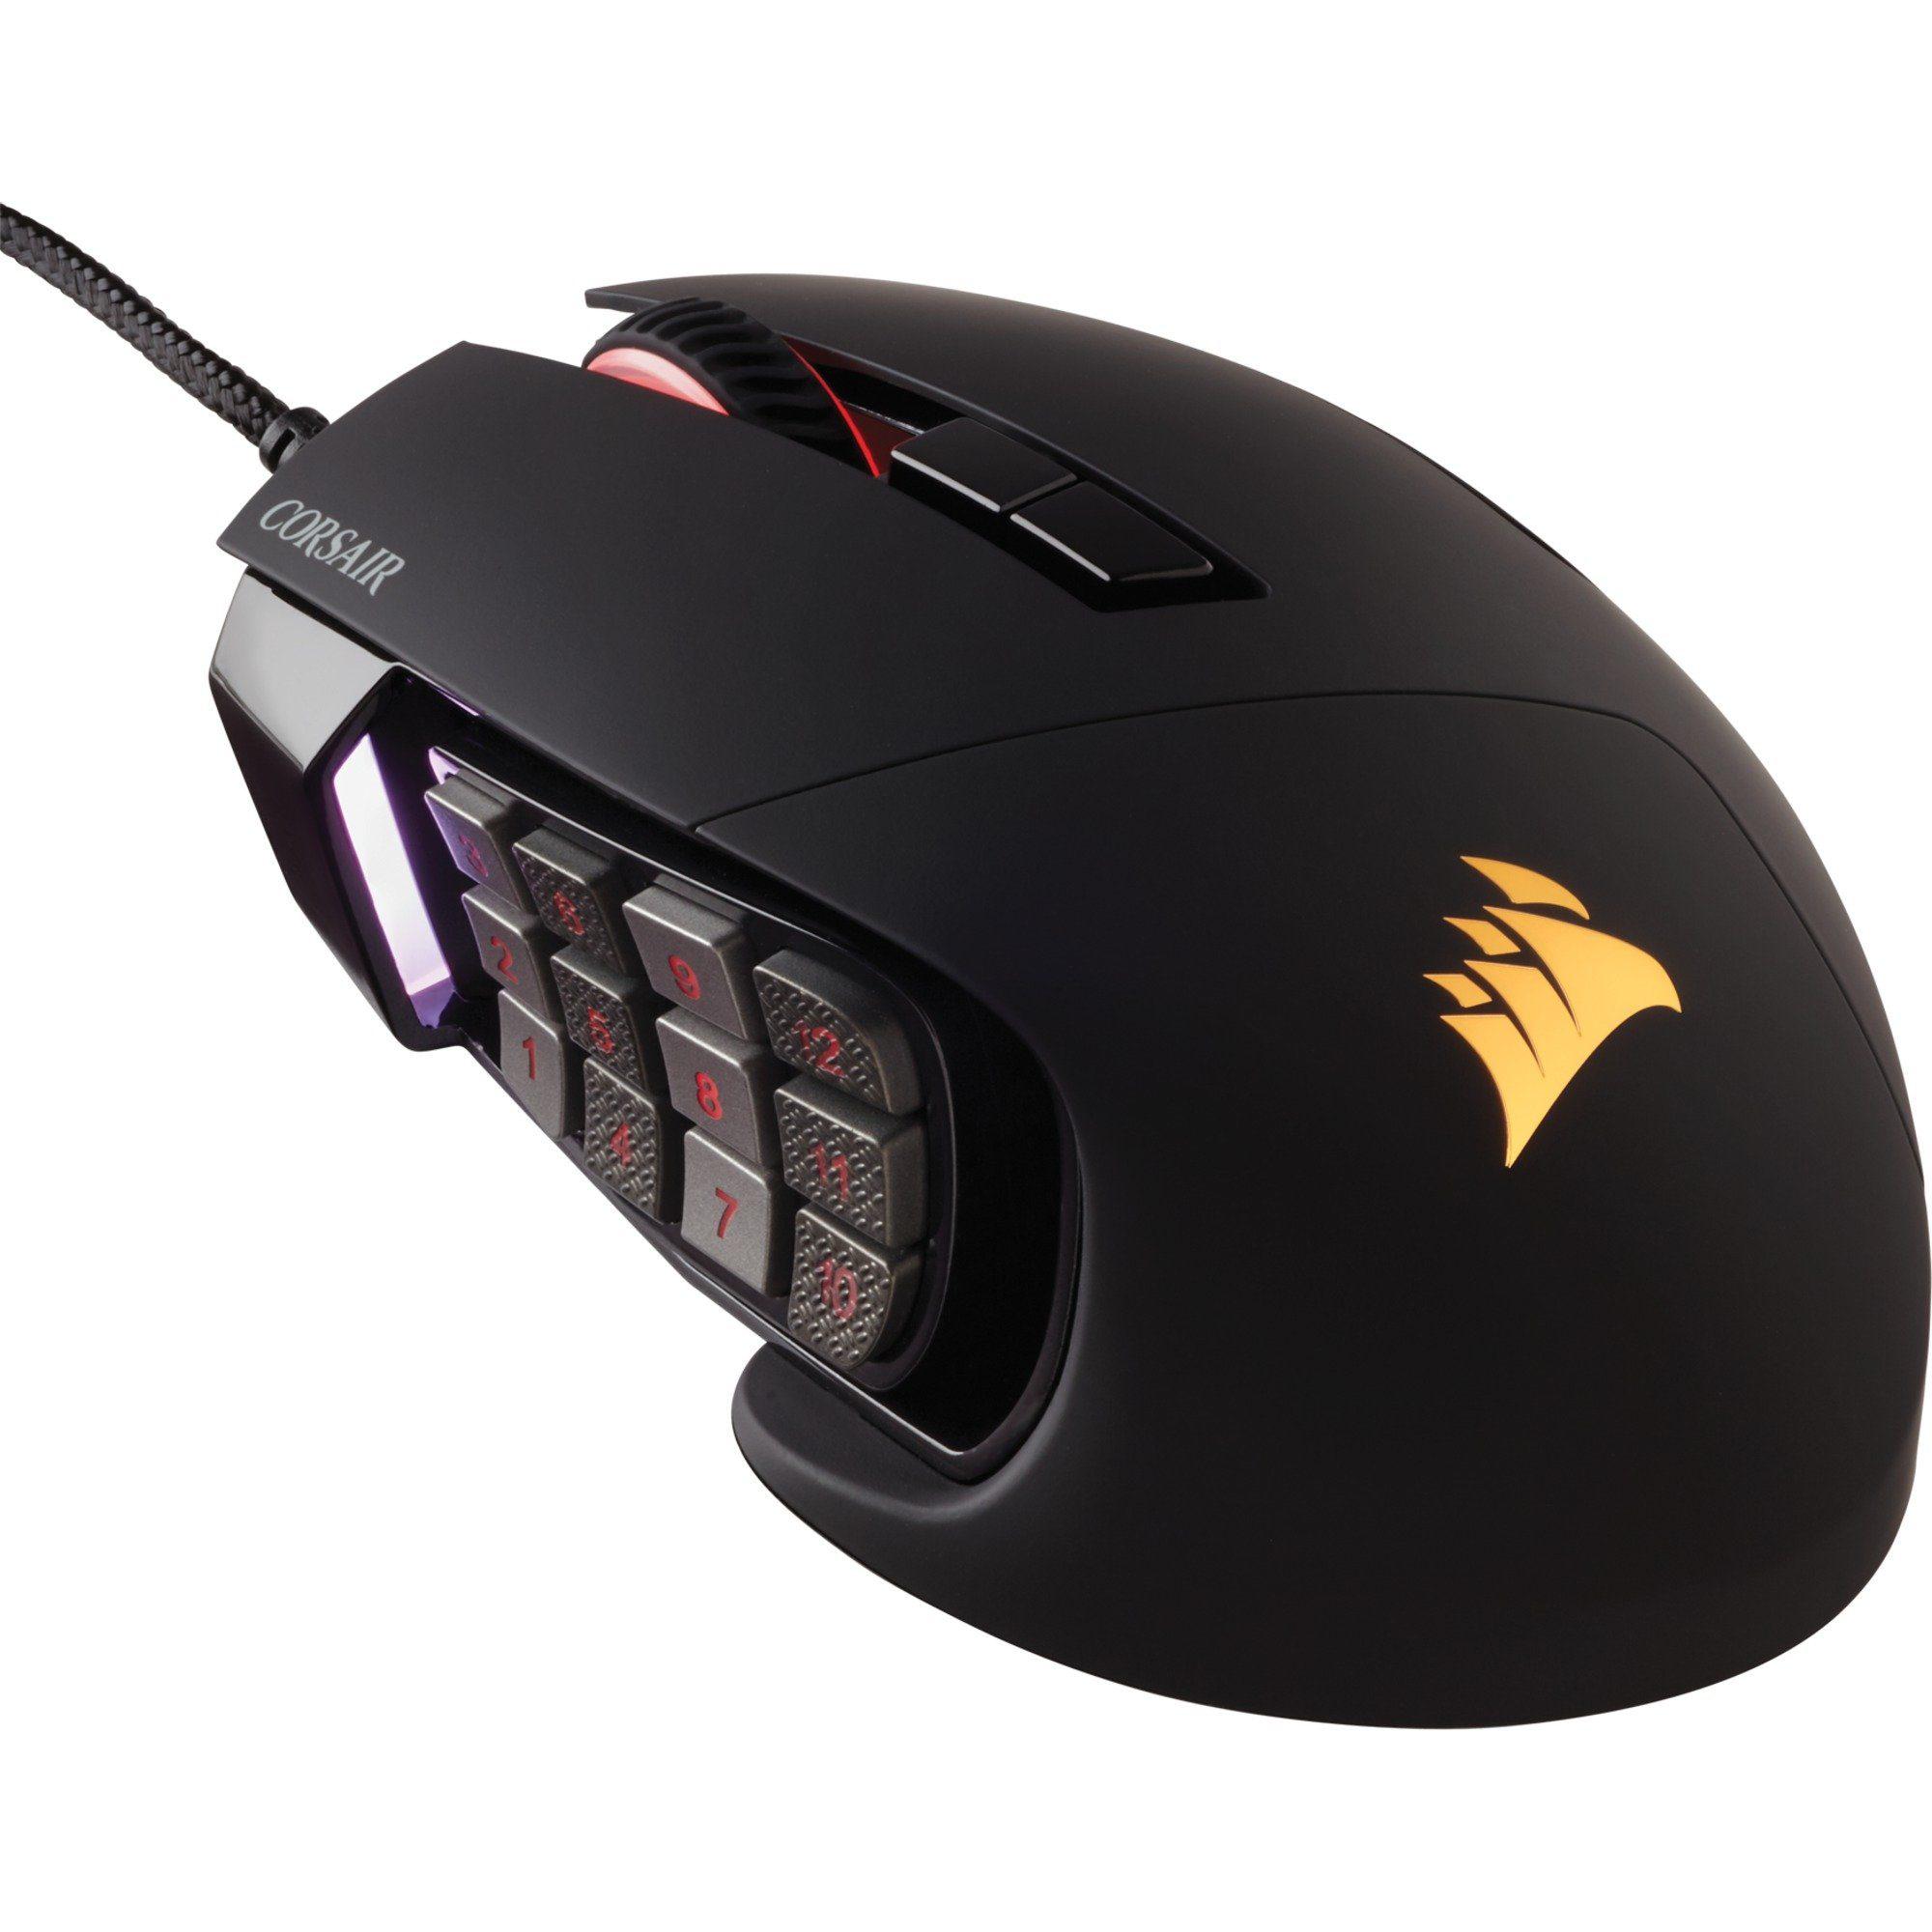 Corsair Maus »Scimitar Pro RGB«